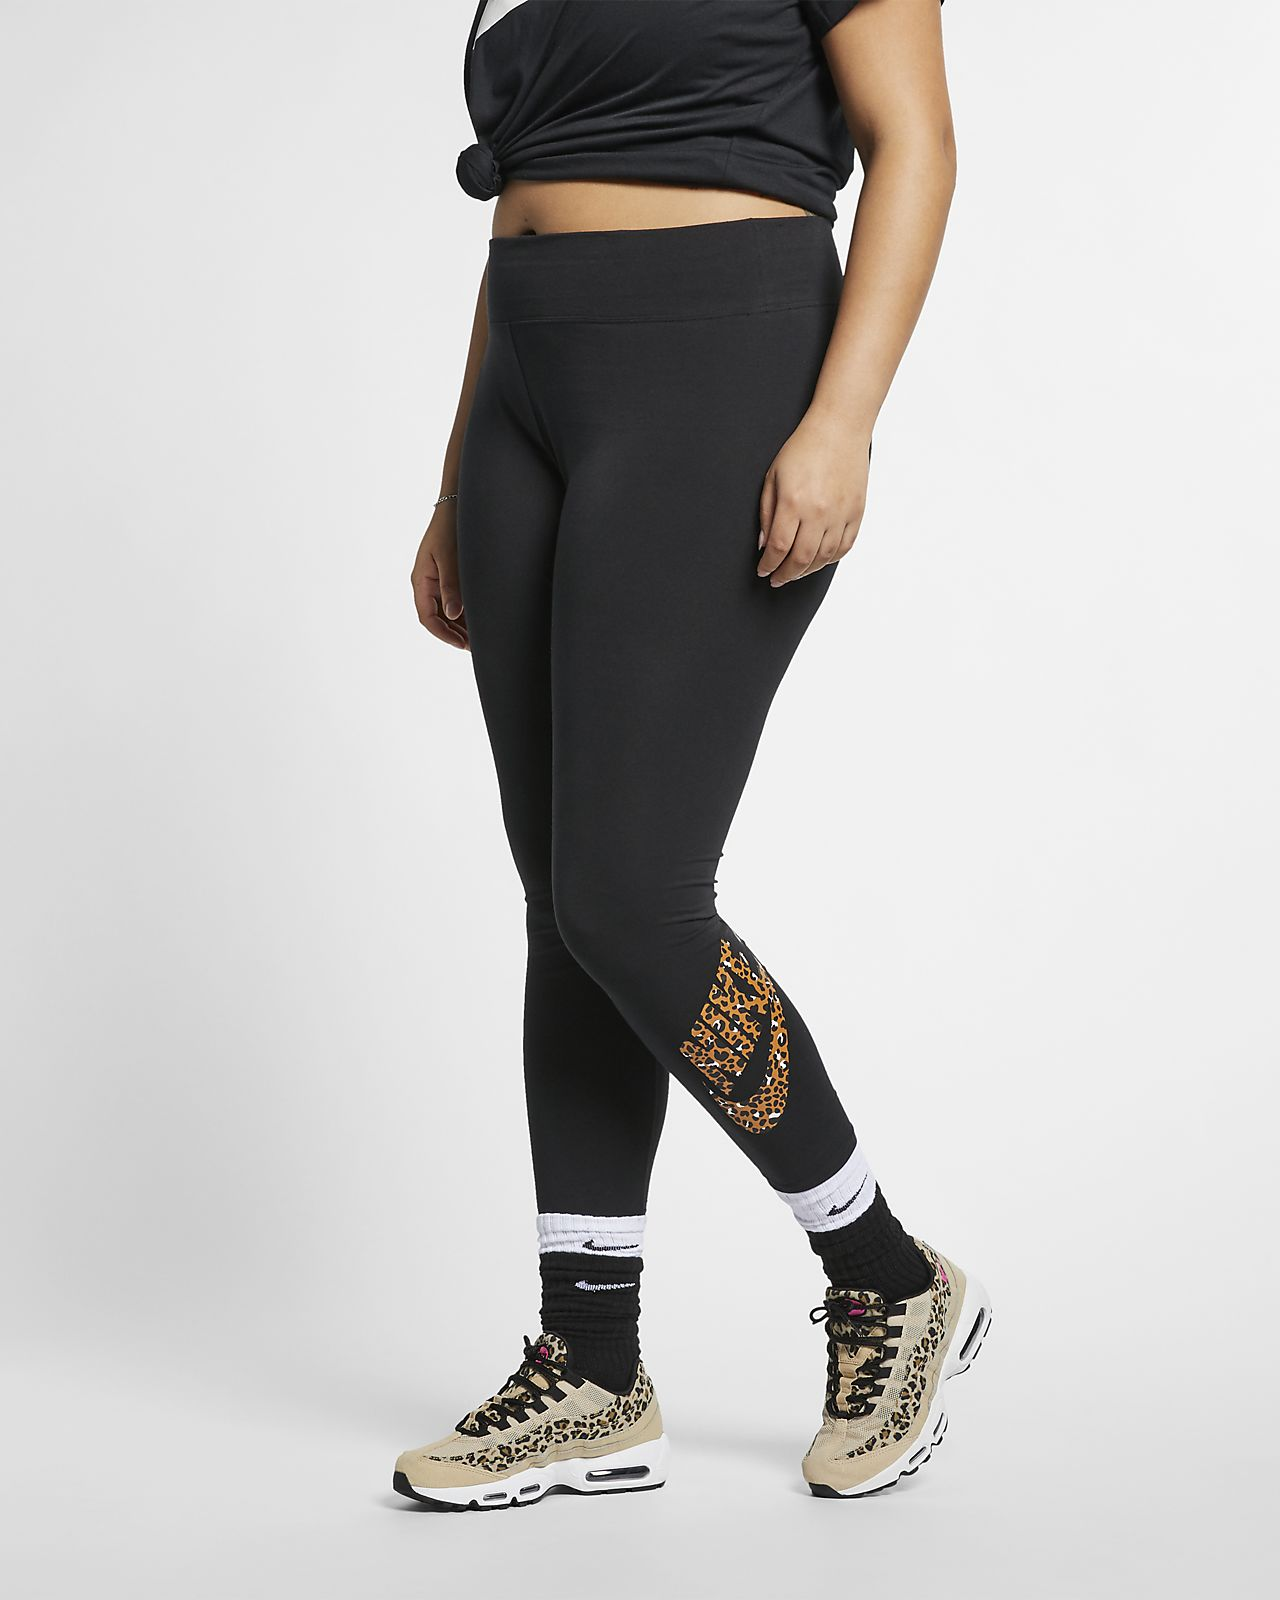 8828e47297991 Low Resolution Nike Sportswear Animal Print Women's Leggings (Plus Size) Nike  Sportswear Animal Print Women's Leggings (Plus Size)